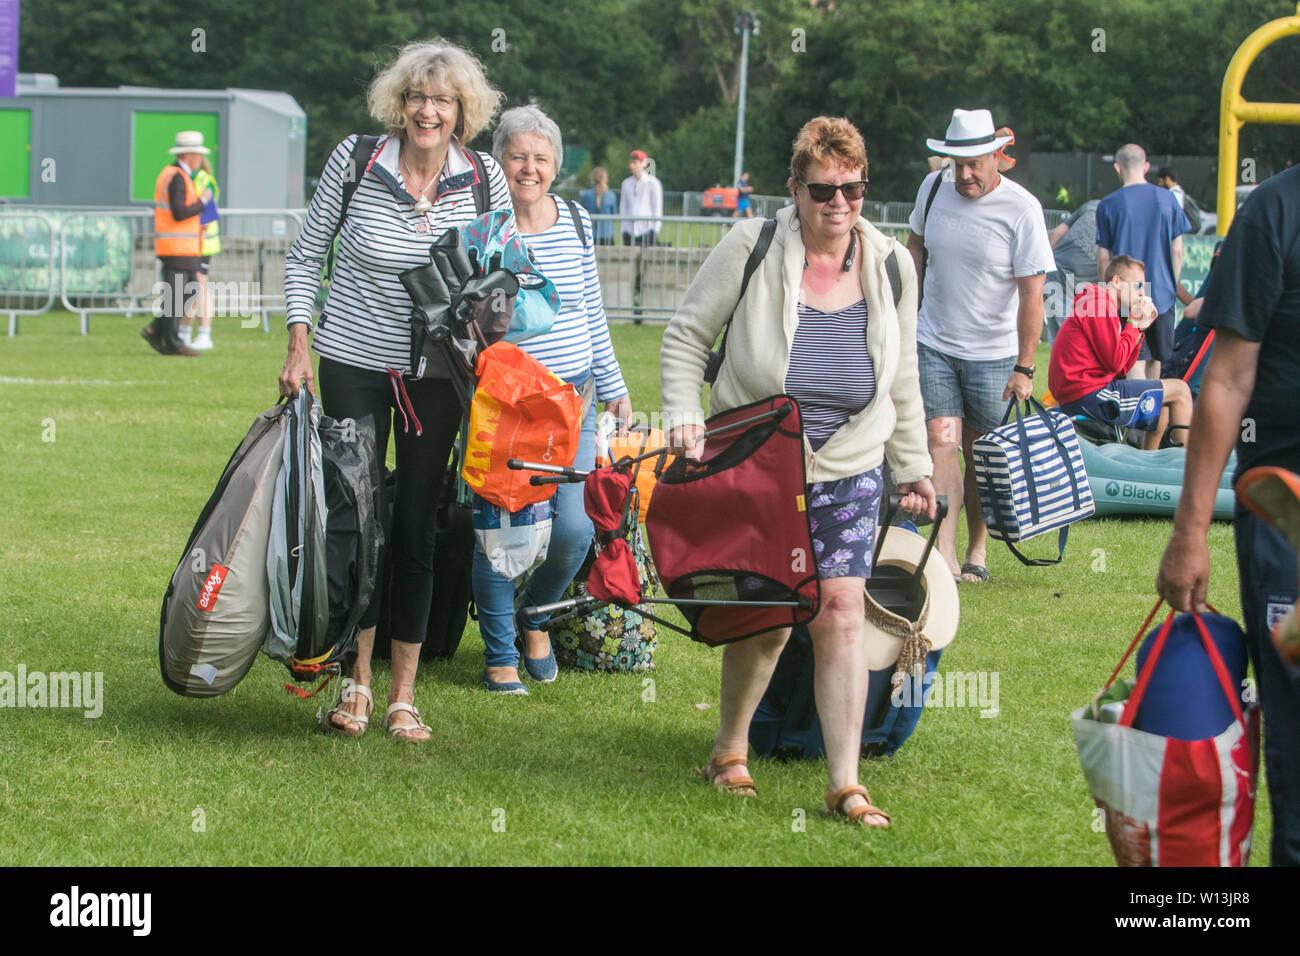 Wimbledon: How to survive the queue - BBC News